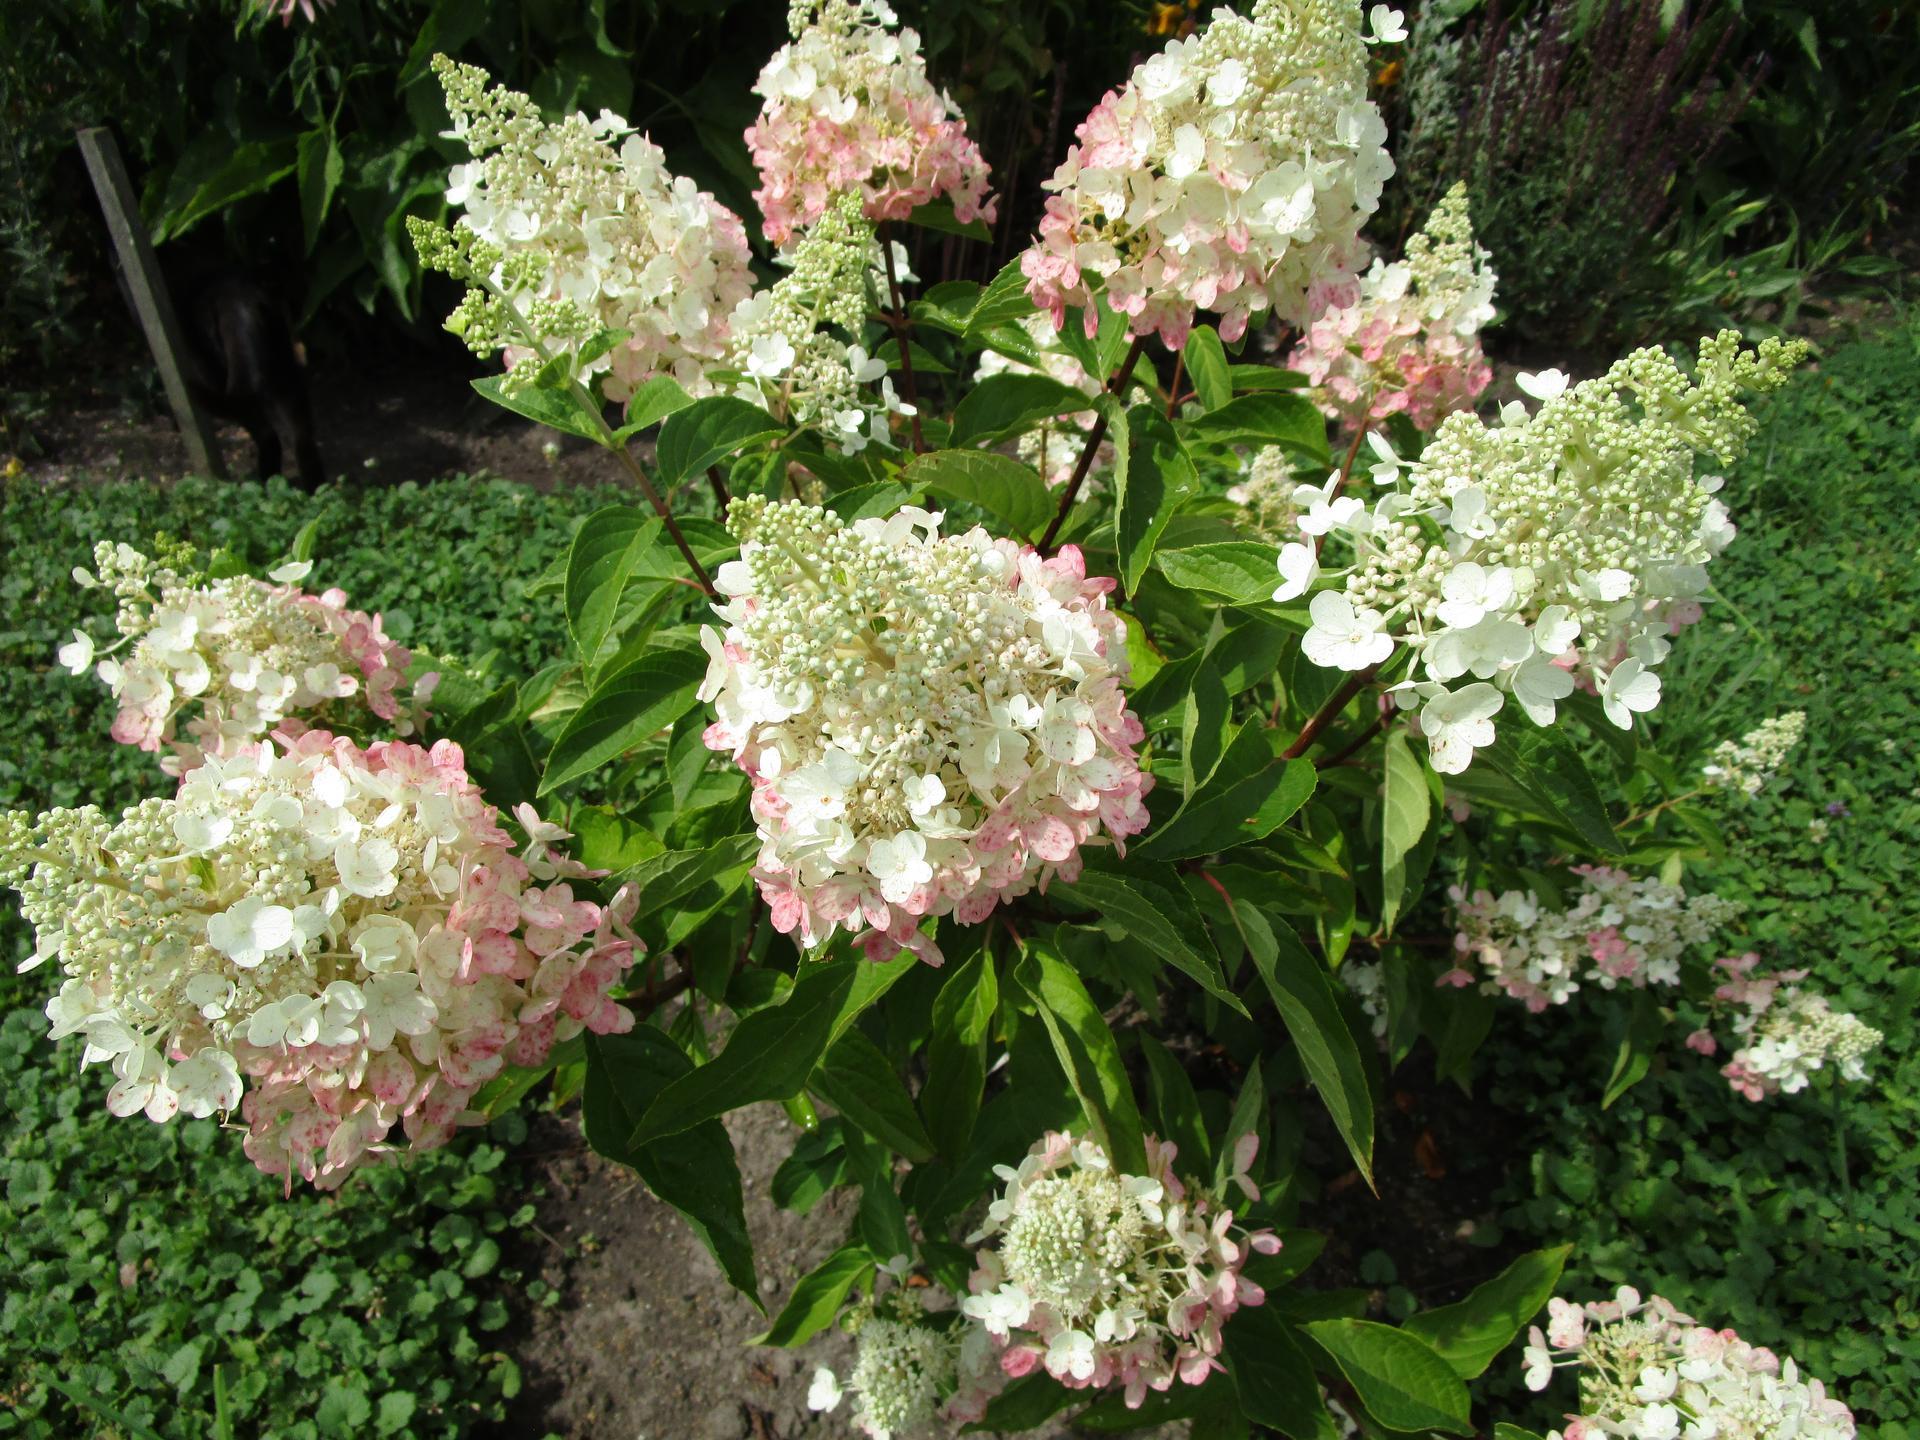 zahrada 2021 - hortenzie latnatá